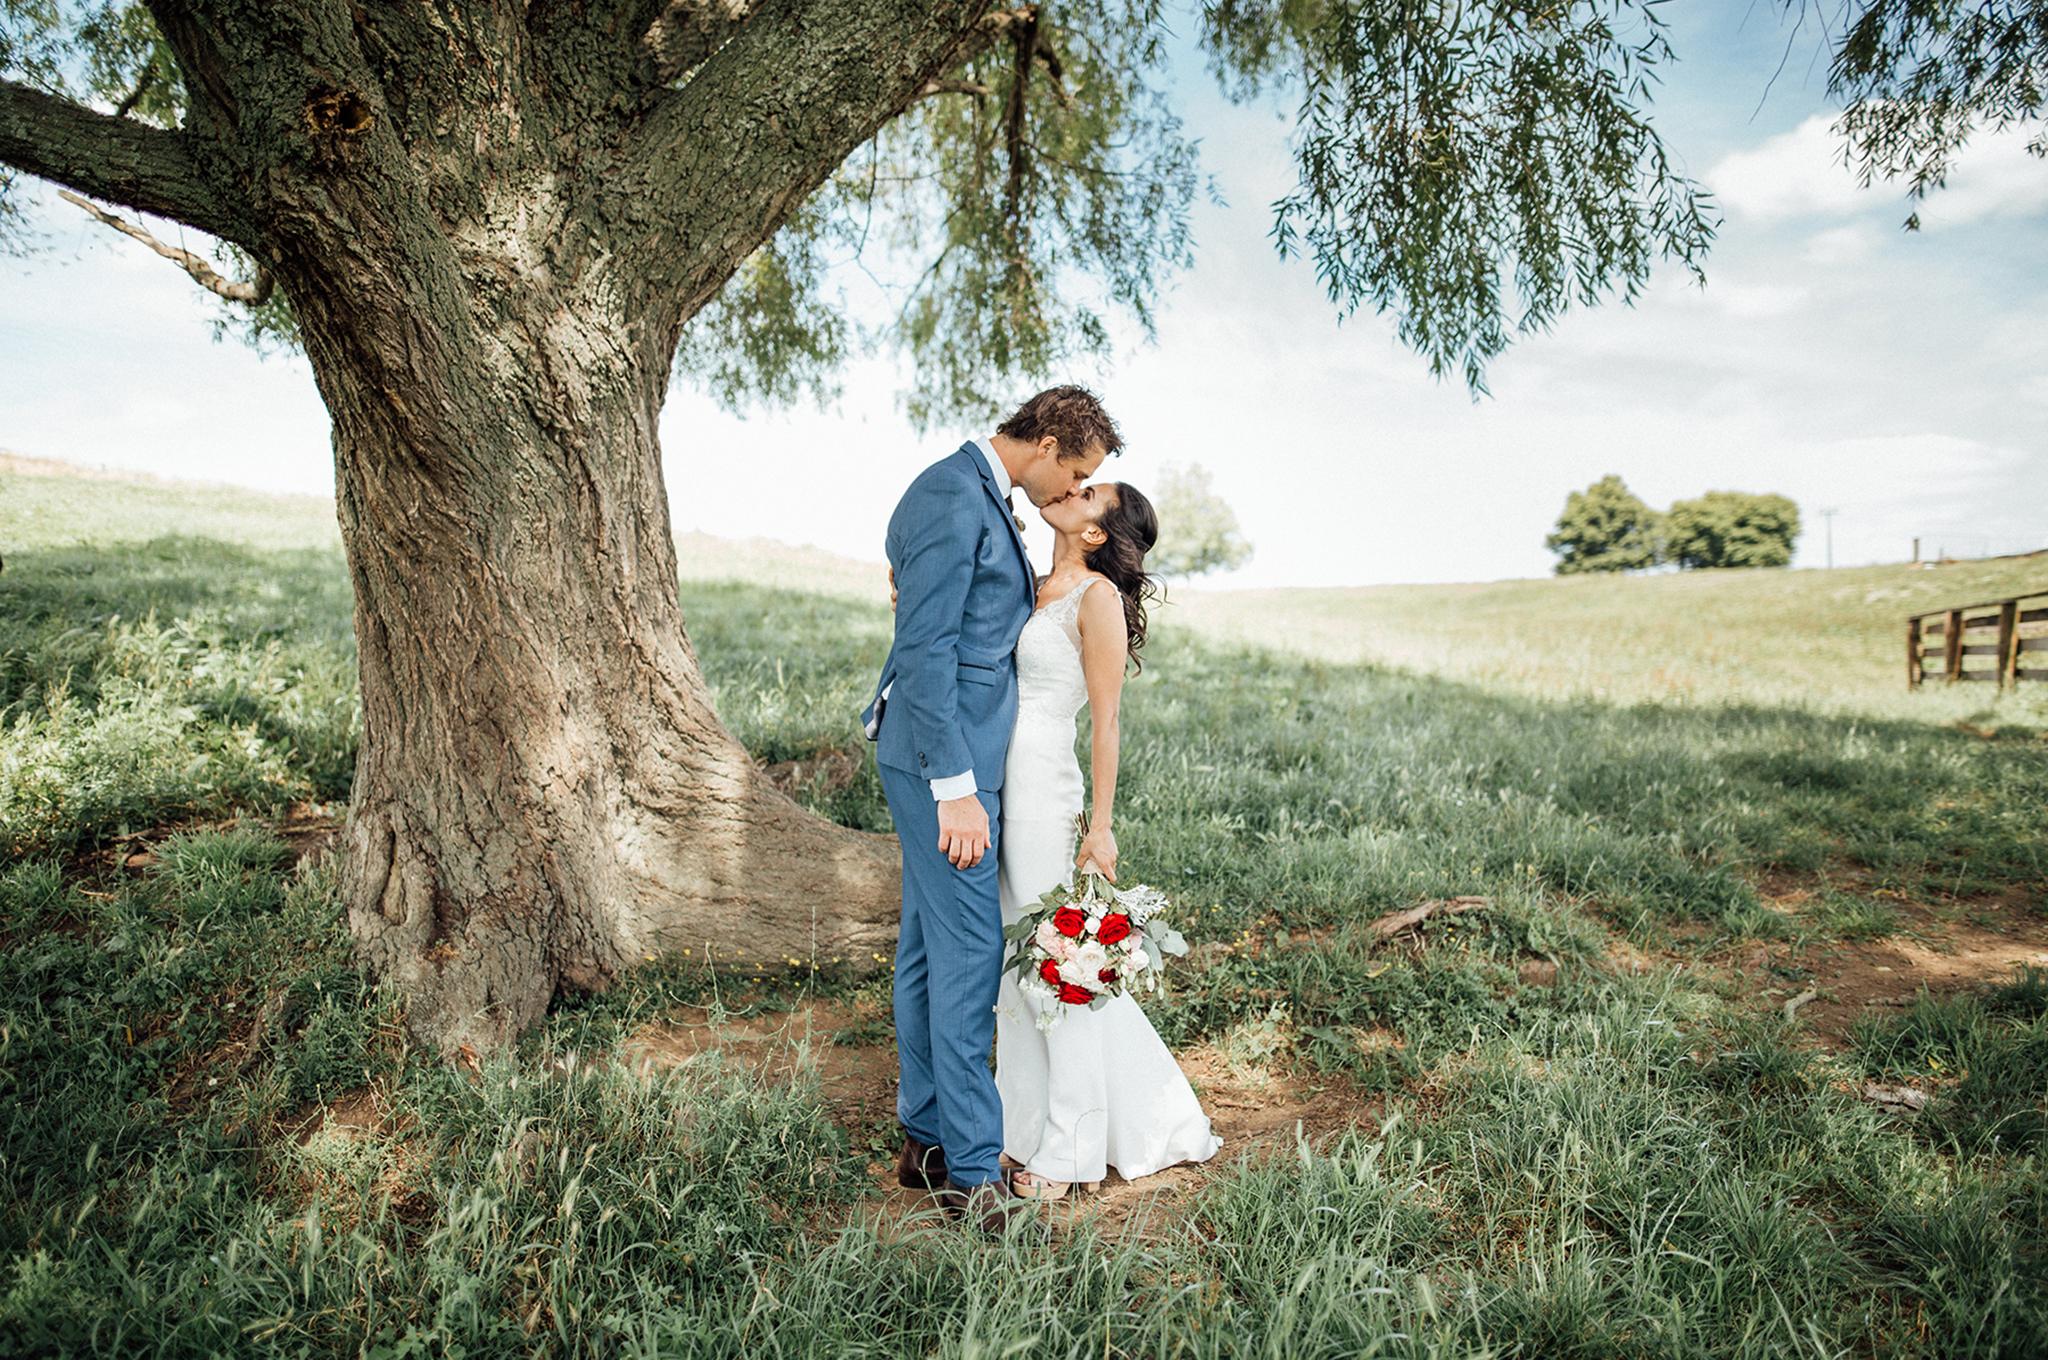 Wedding Photography kiss Te Awamutu Waikato